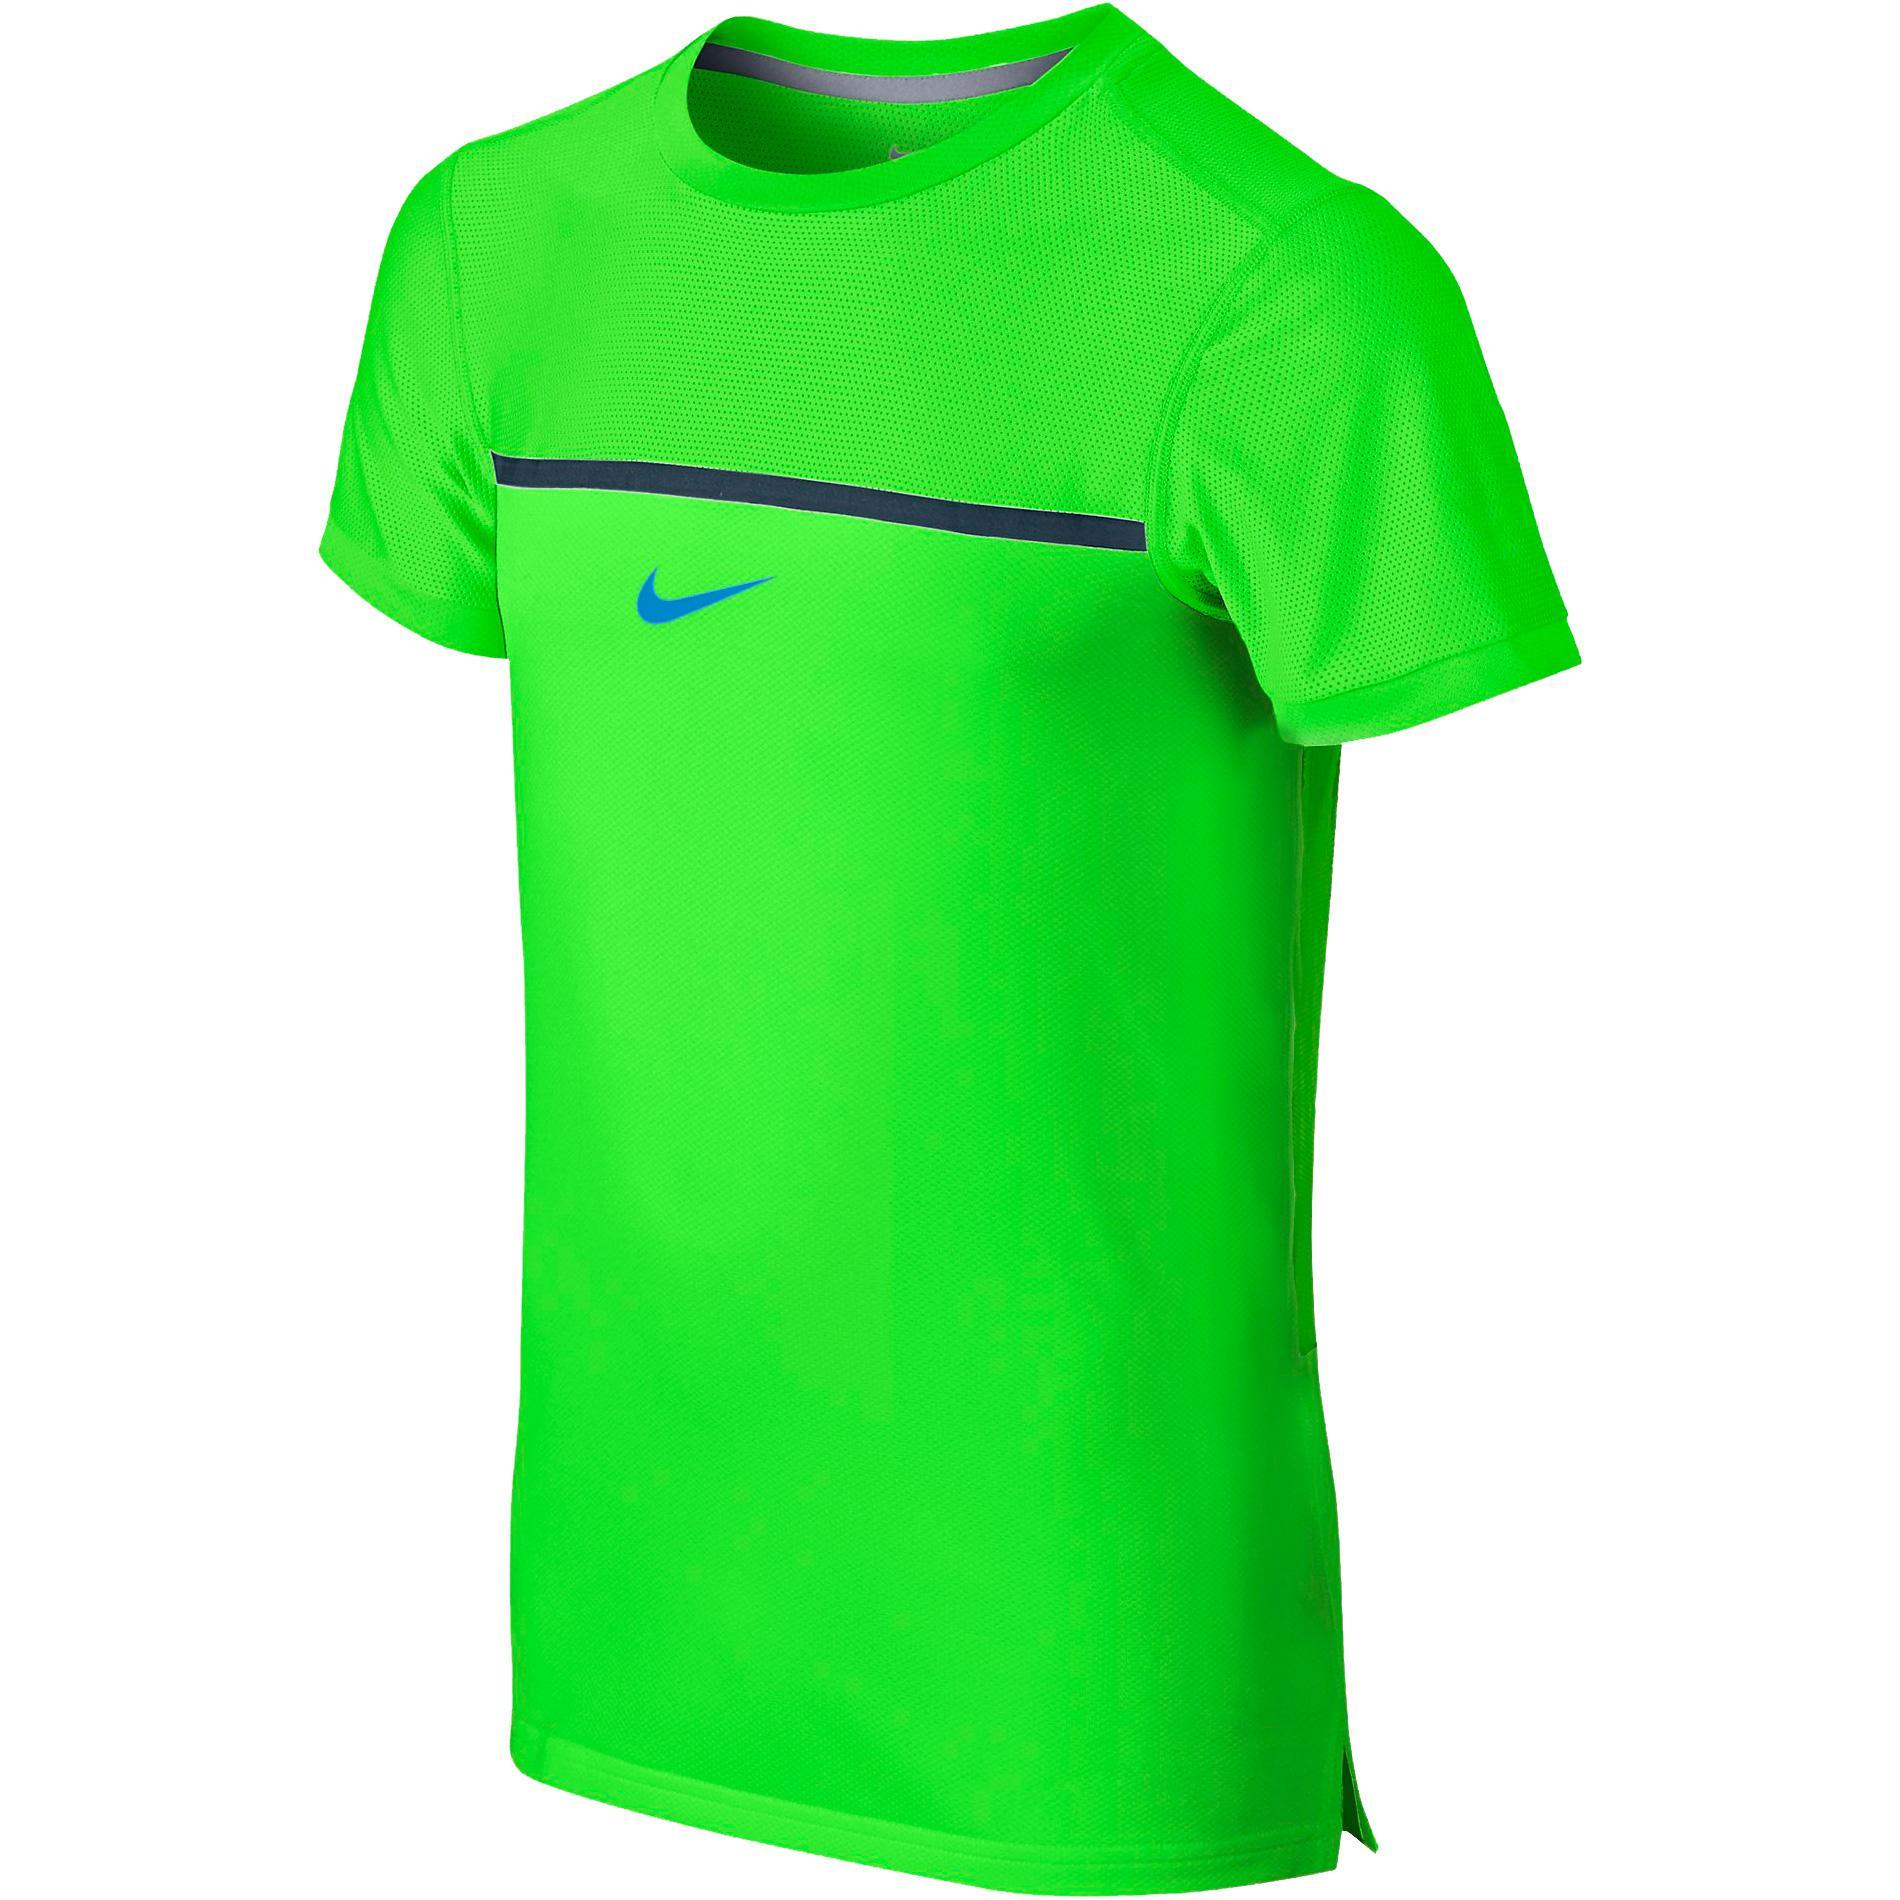 size 40 5fe97 498ed Nike Boys Challenger Premier Rafa Crew - Green - Tennisnuts.